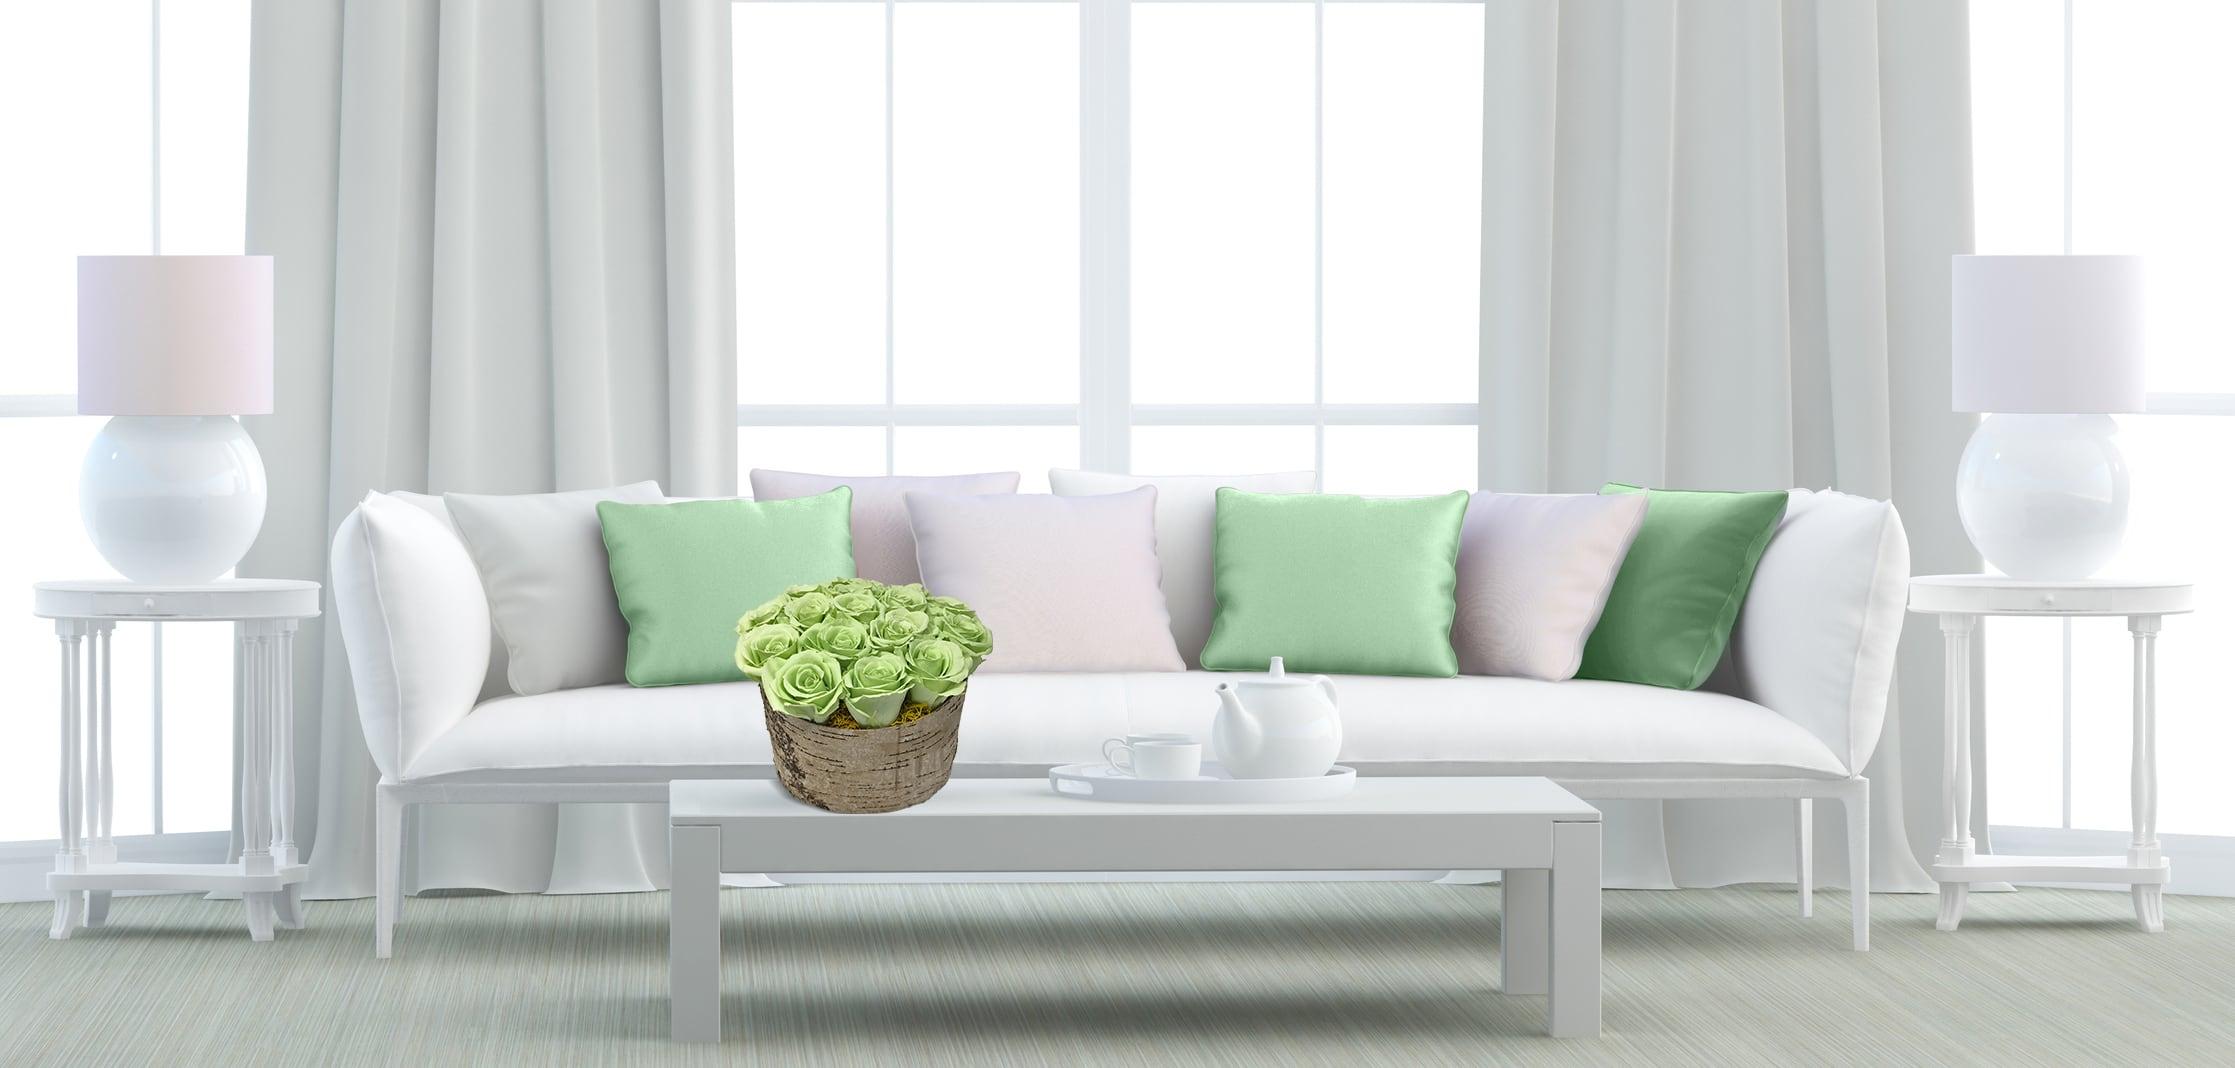 Green Roses Interior Arrangement